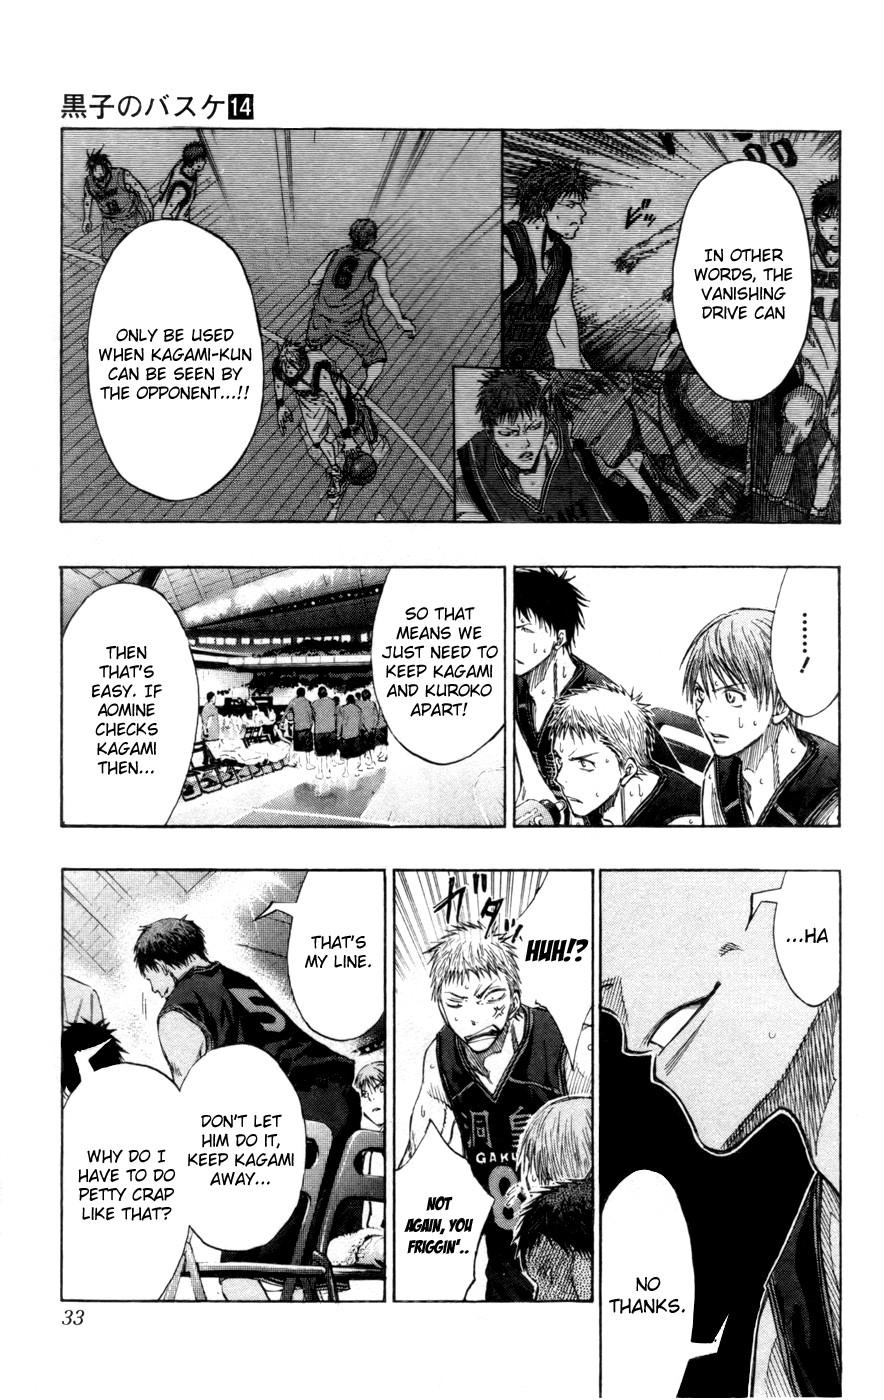 Kuroko no Basket Manga Chapter 119 - Image 4_033